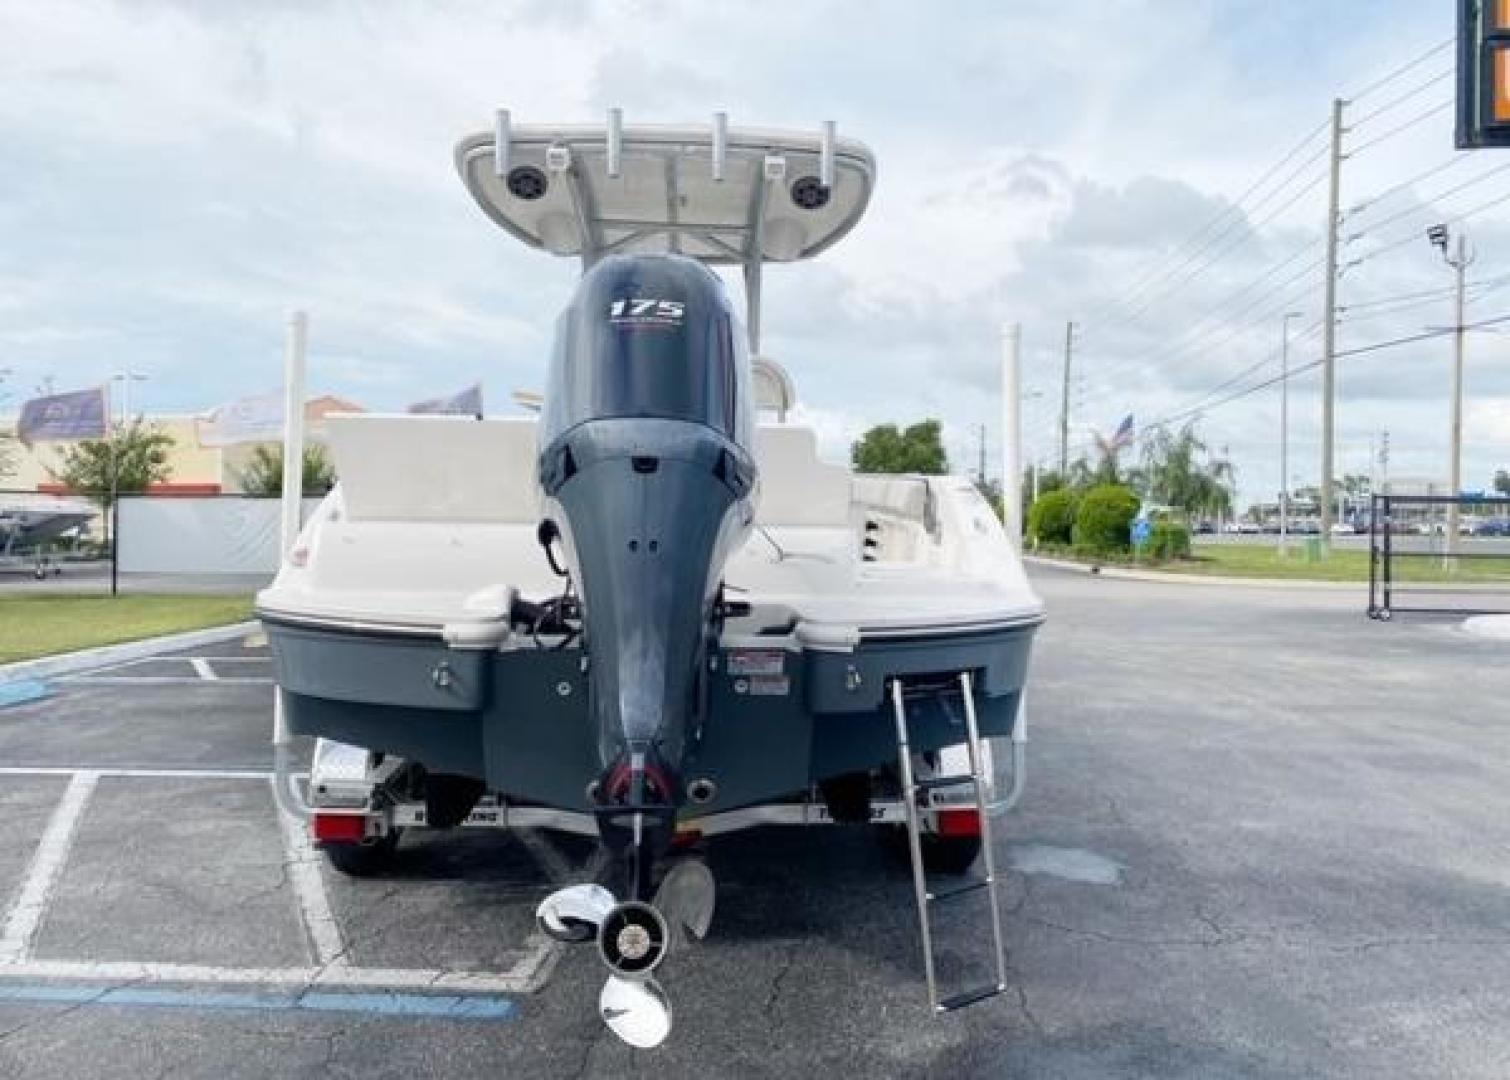 Starcraft-MDX 211 CC 2021-Starcraft MDX 211 CC Tampa Bay-Florida-United States-1532988 | Thumbnail